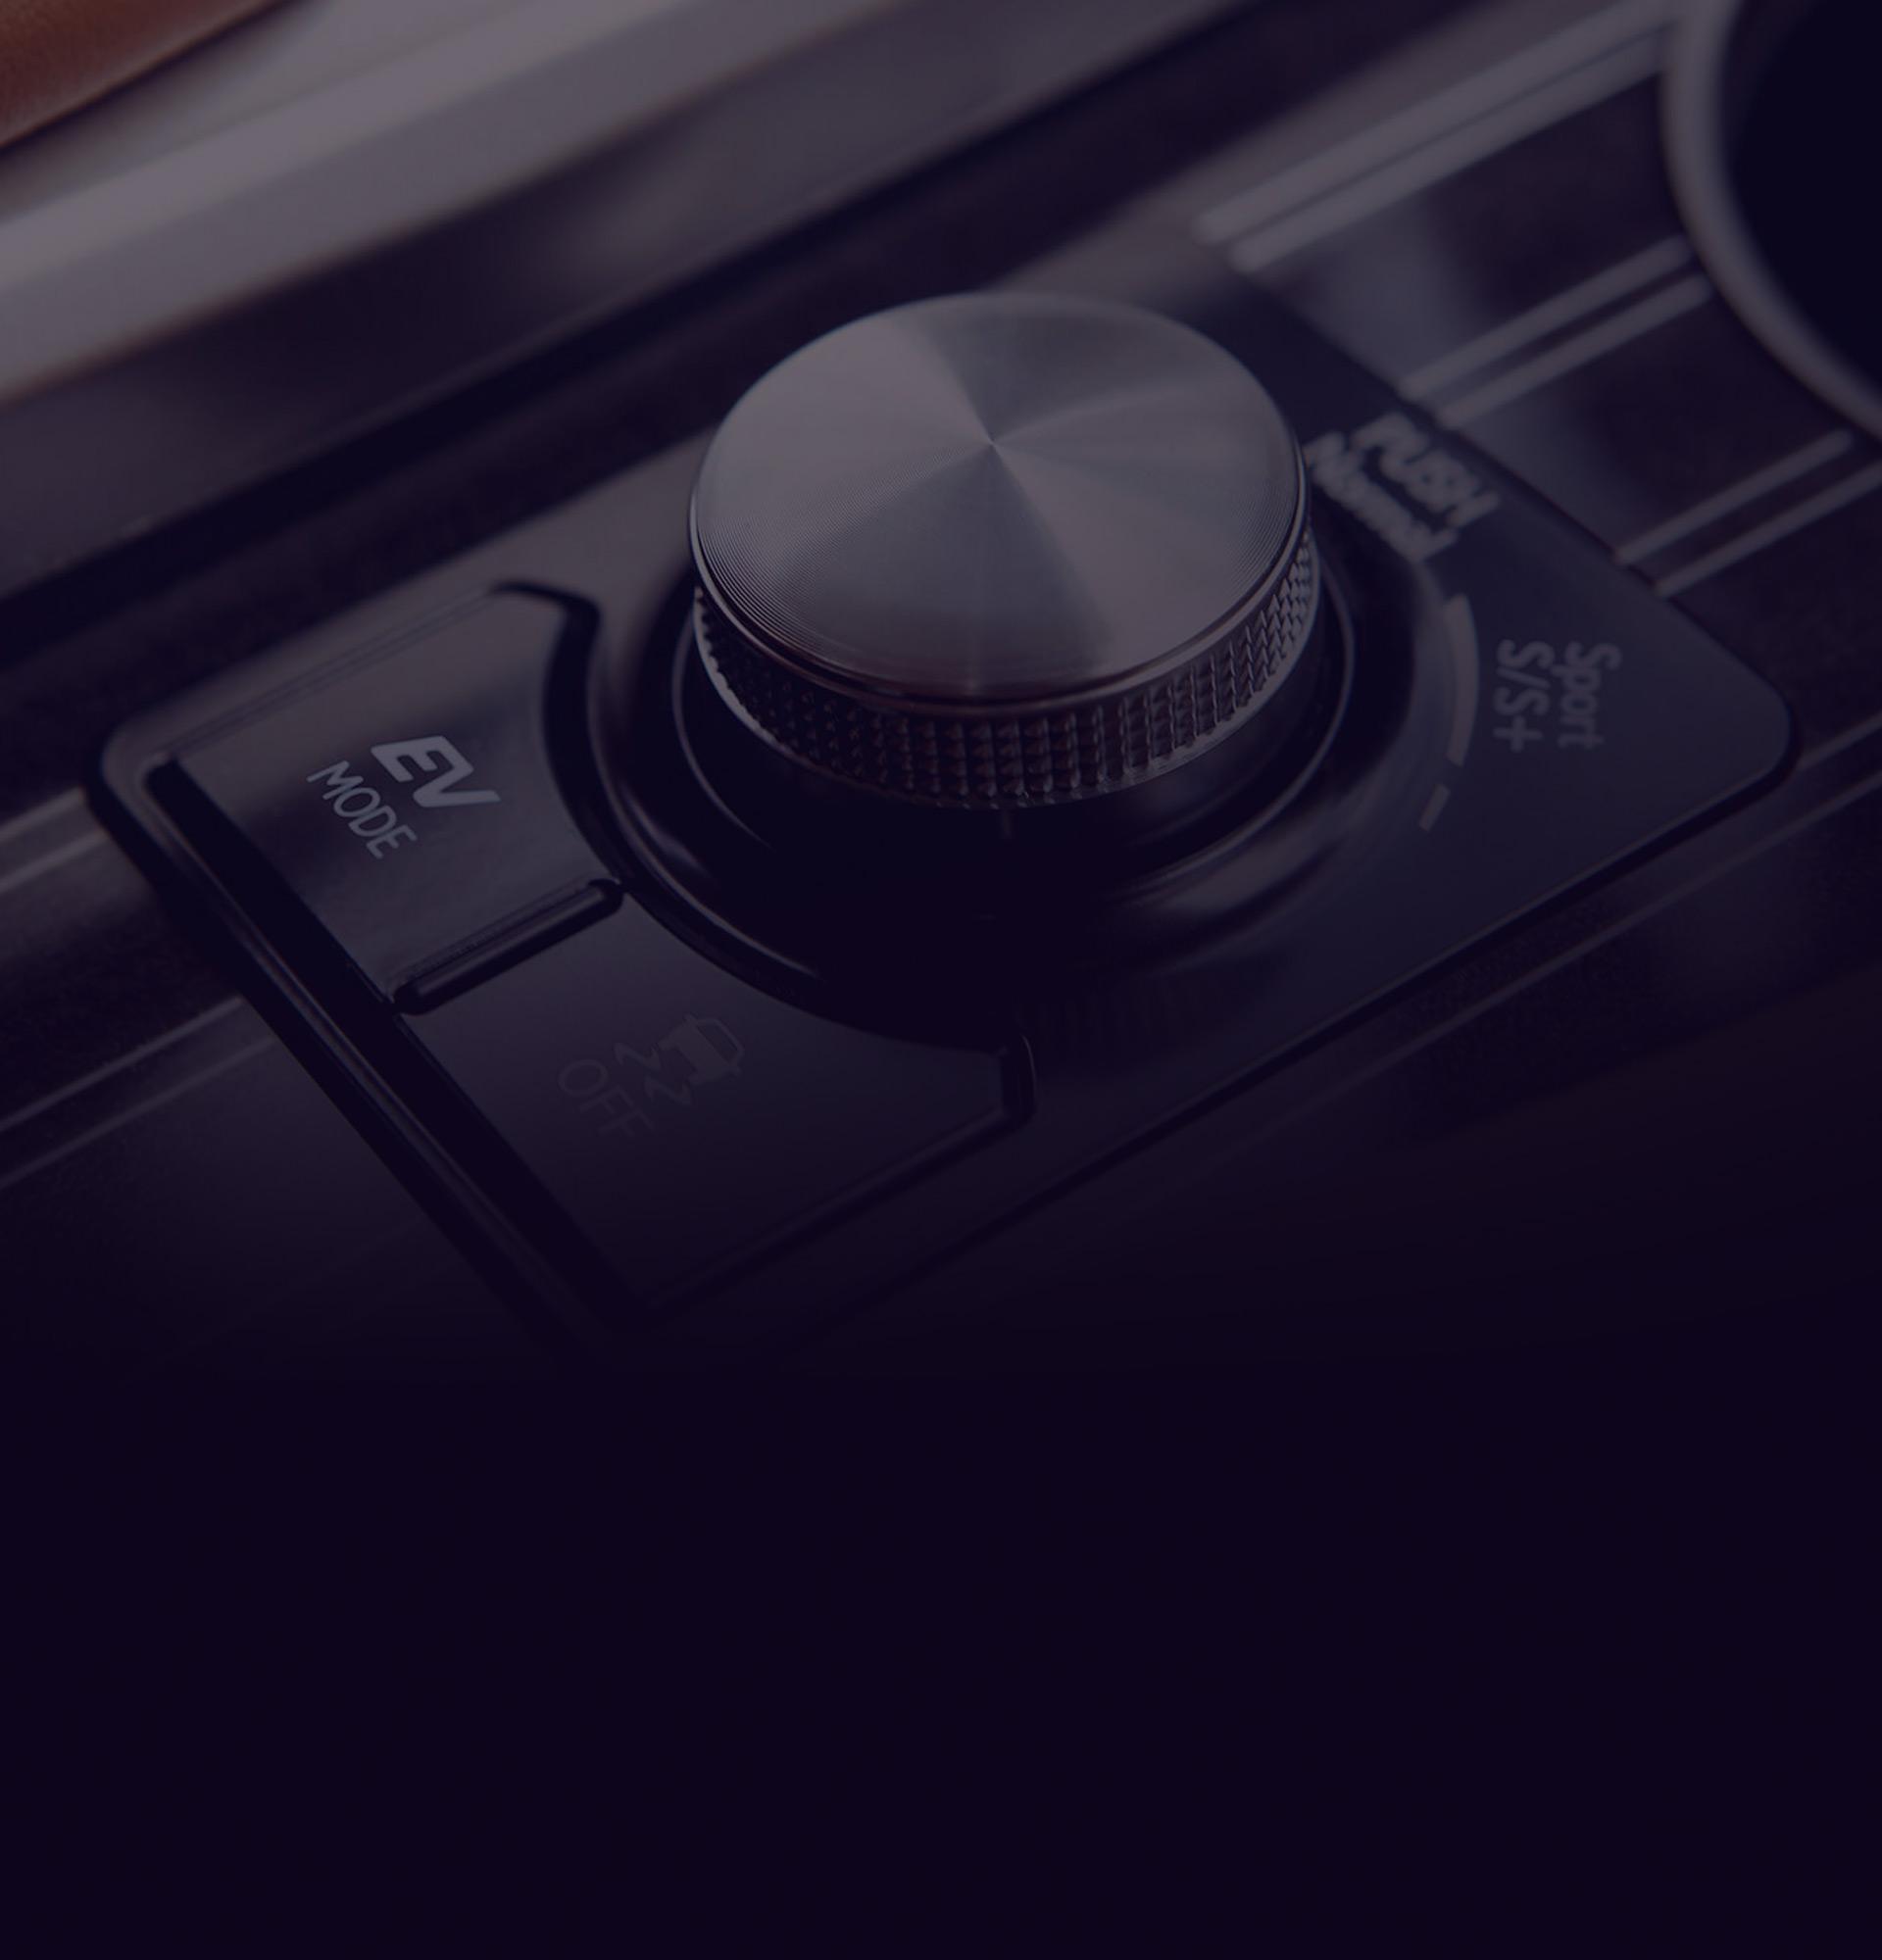 Lexus2020 SebCoeAlexHaydock Wilson Chapter5 1920x2000 BG